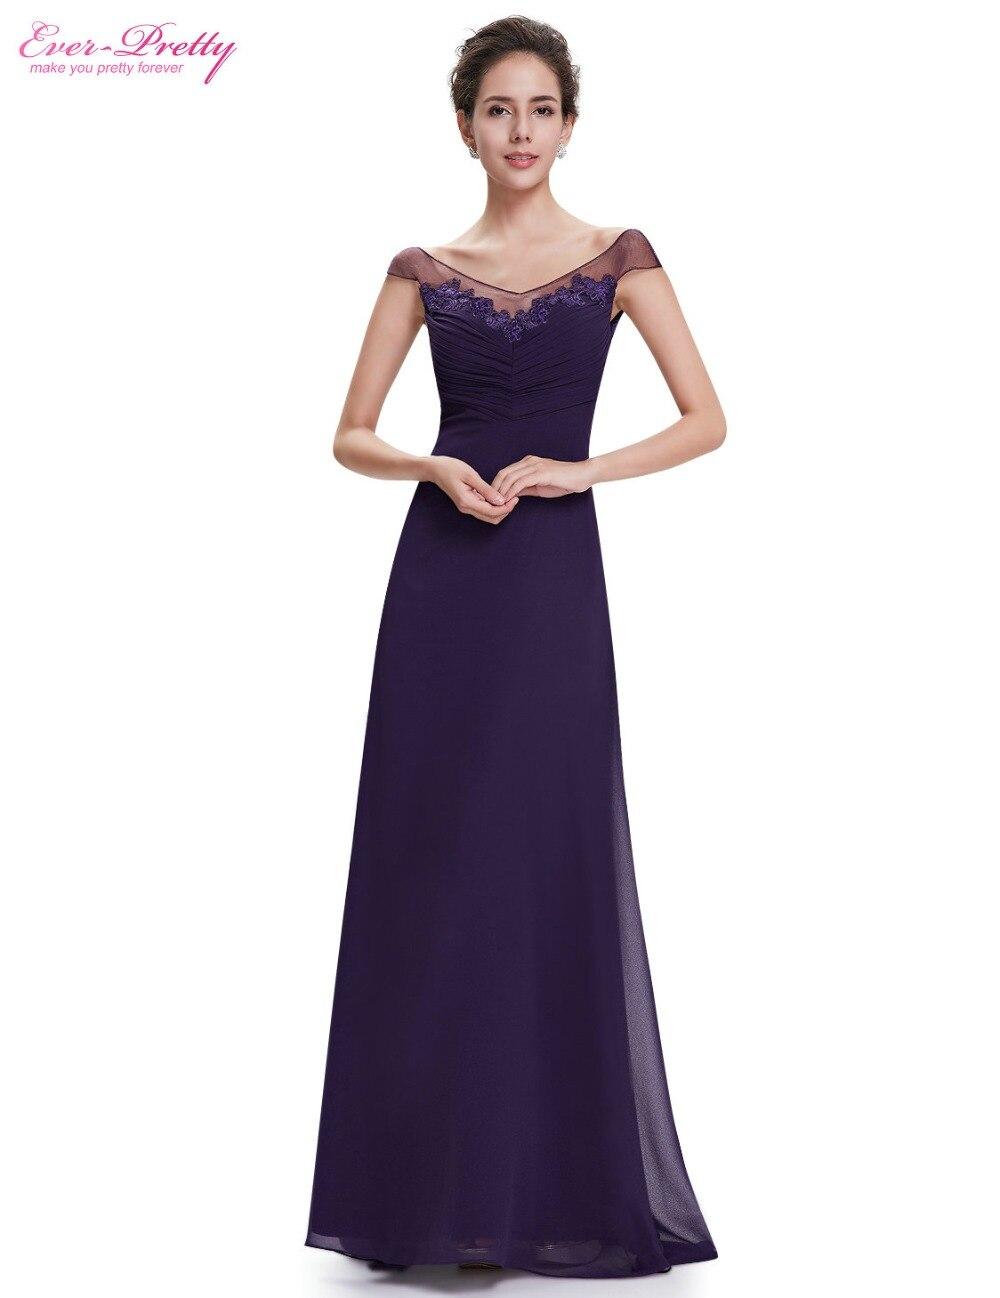 Ever Pretty Womens Evening Dresses He08684Pp Womens Beautiful Elegant Purple V Neck -2193